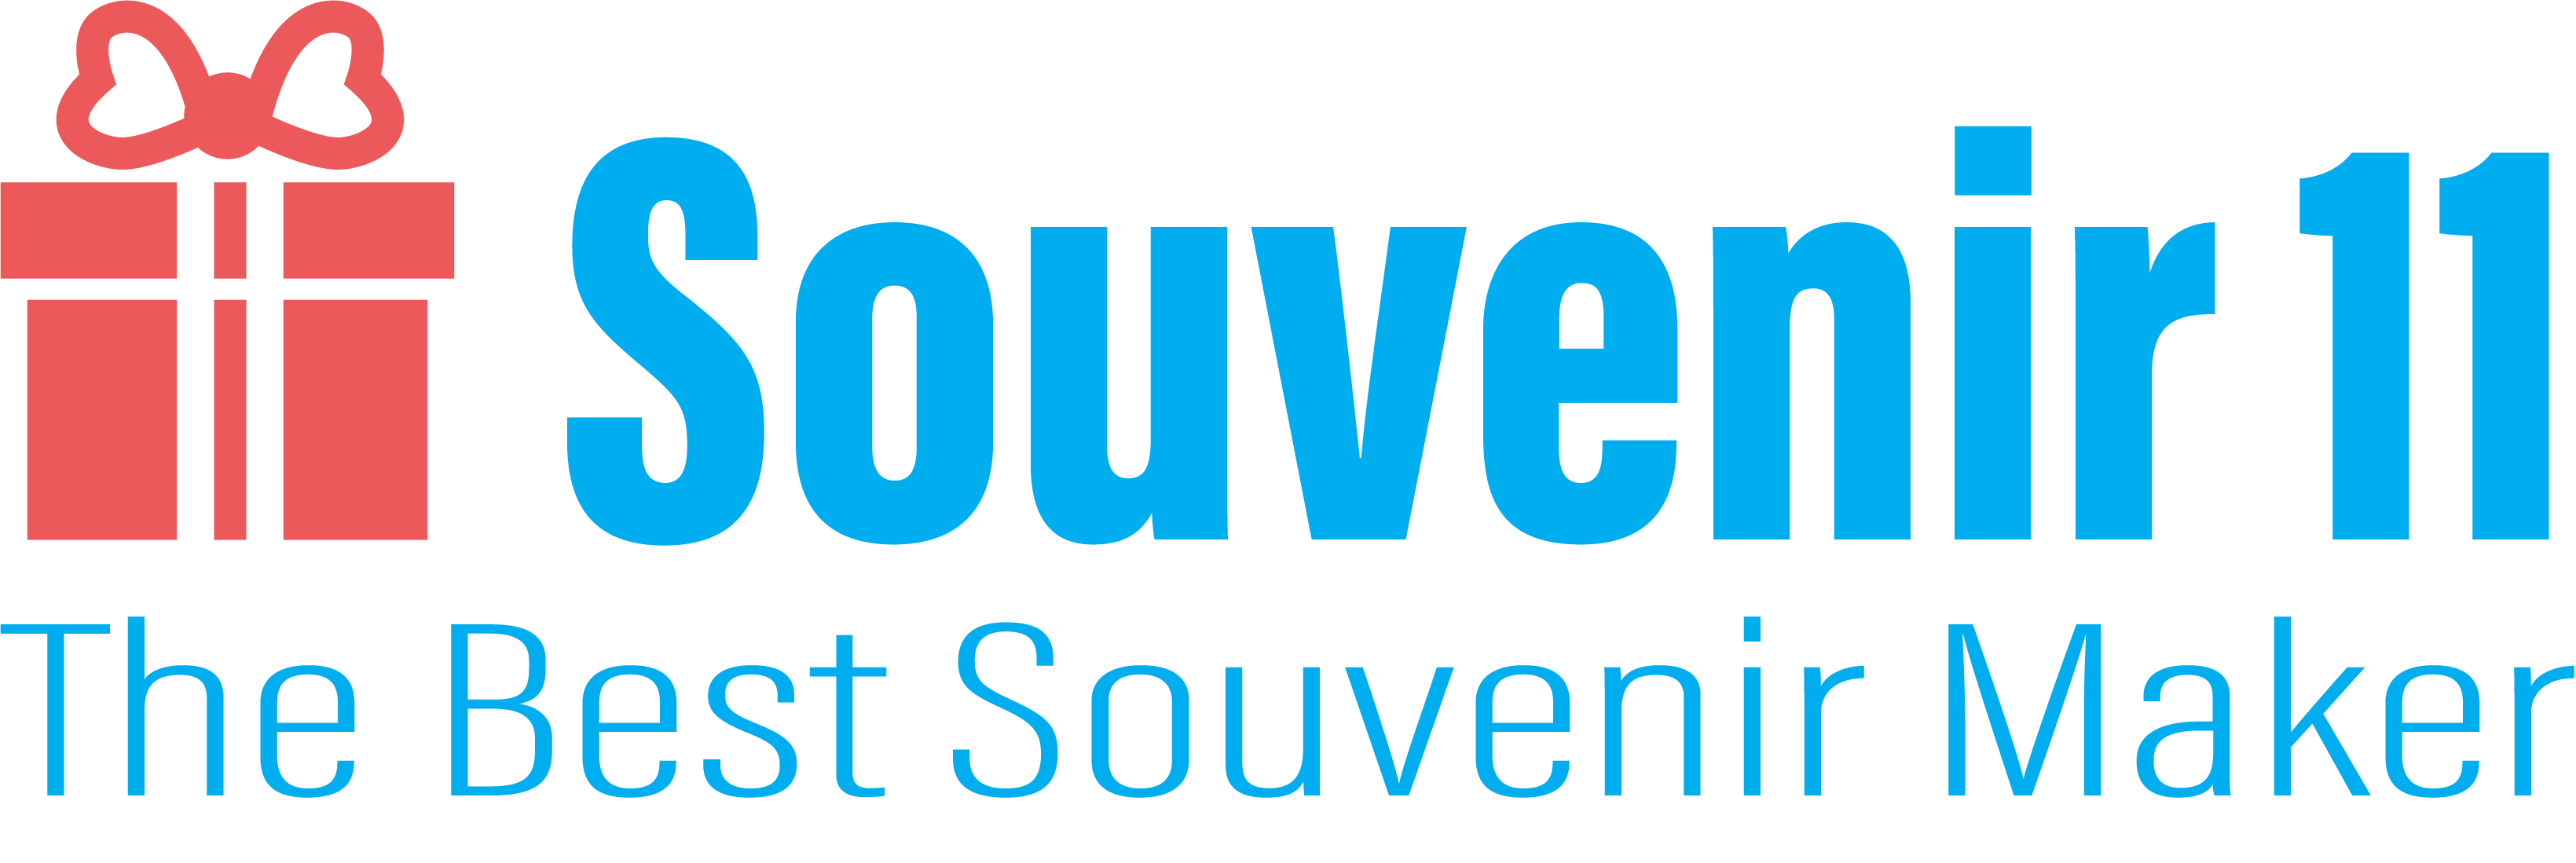 Souvenir 11